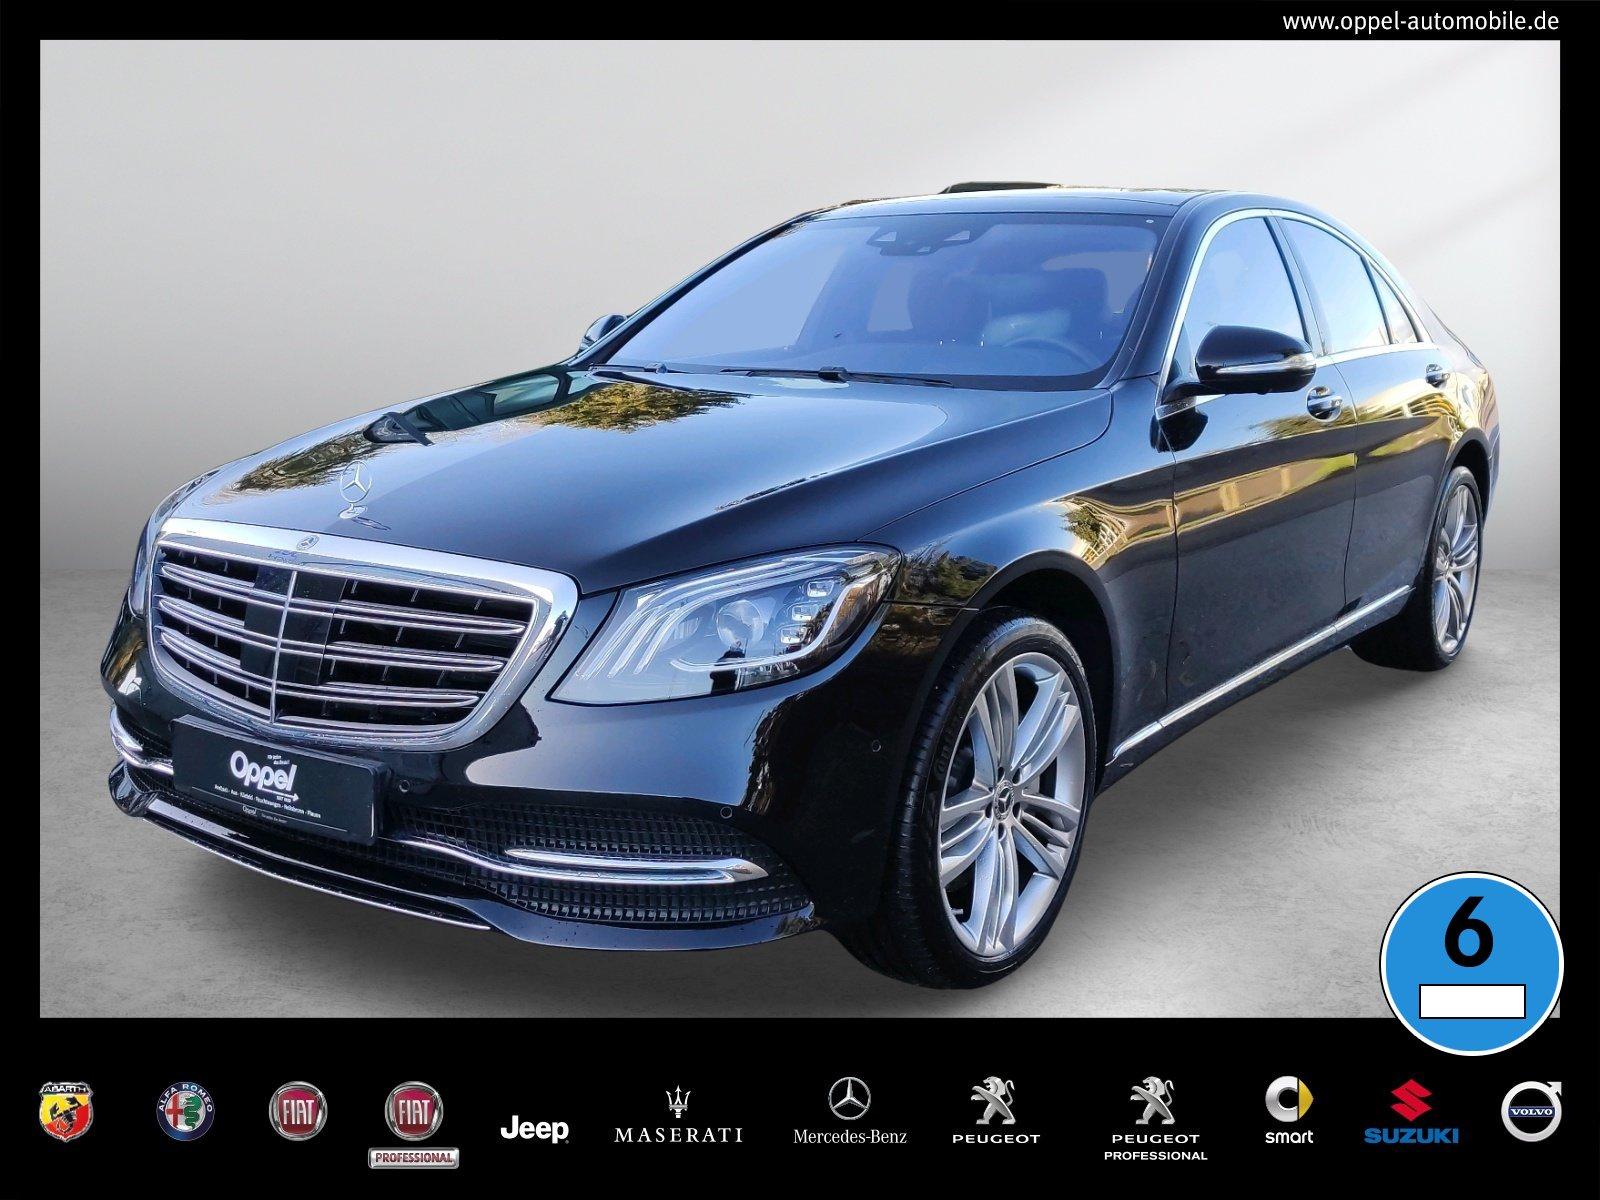 Mercedes-Benz S 560 Limousine NAVI+DISTRONIC+PANO+HUD+360°KAM, Jahr 2018, Benzin